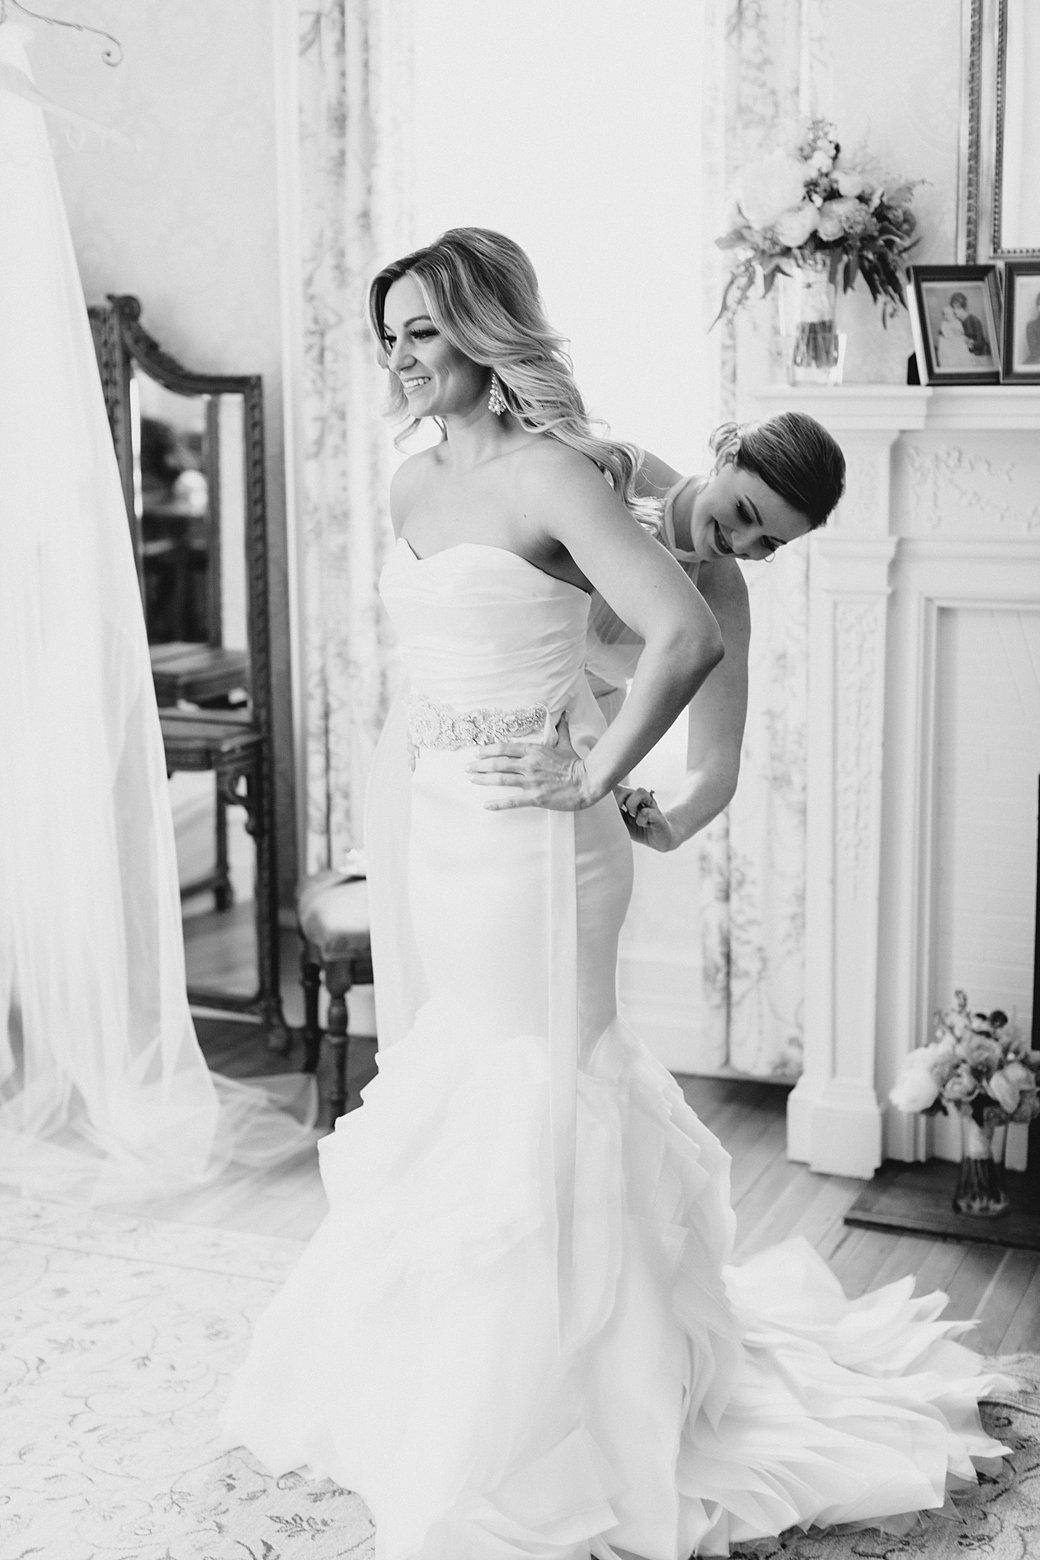 lauren_fair_photography_april_lynn_designs_stasia_matt_spring_cairnwood_estate_wedding_northeast_philadelphia_blush_pink_gold_wedding_invitation_stationery_0028